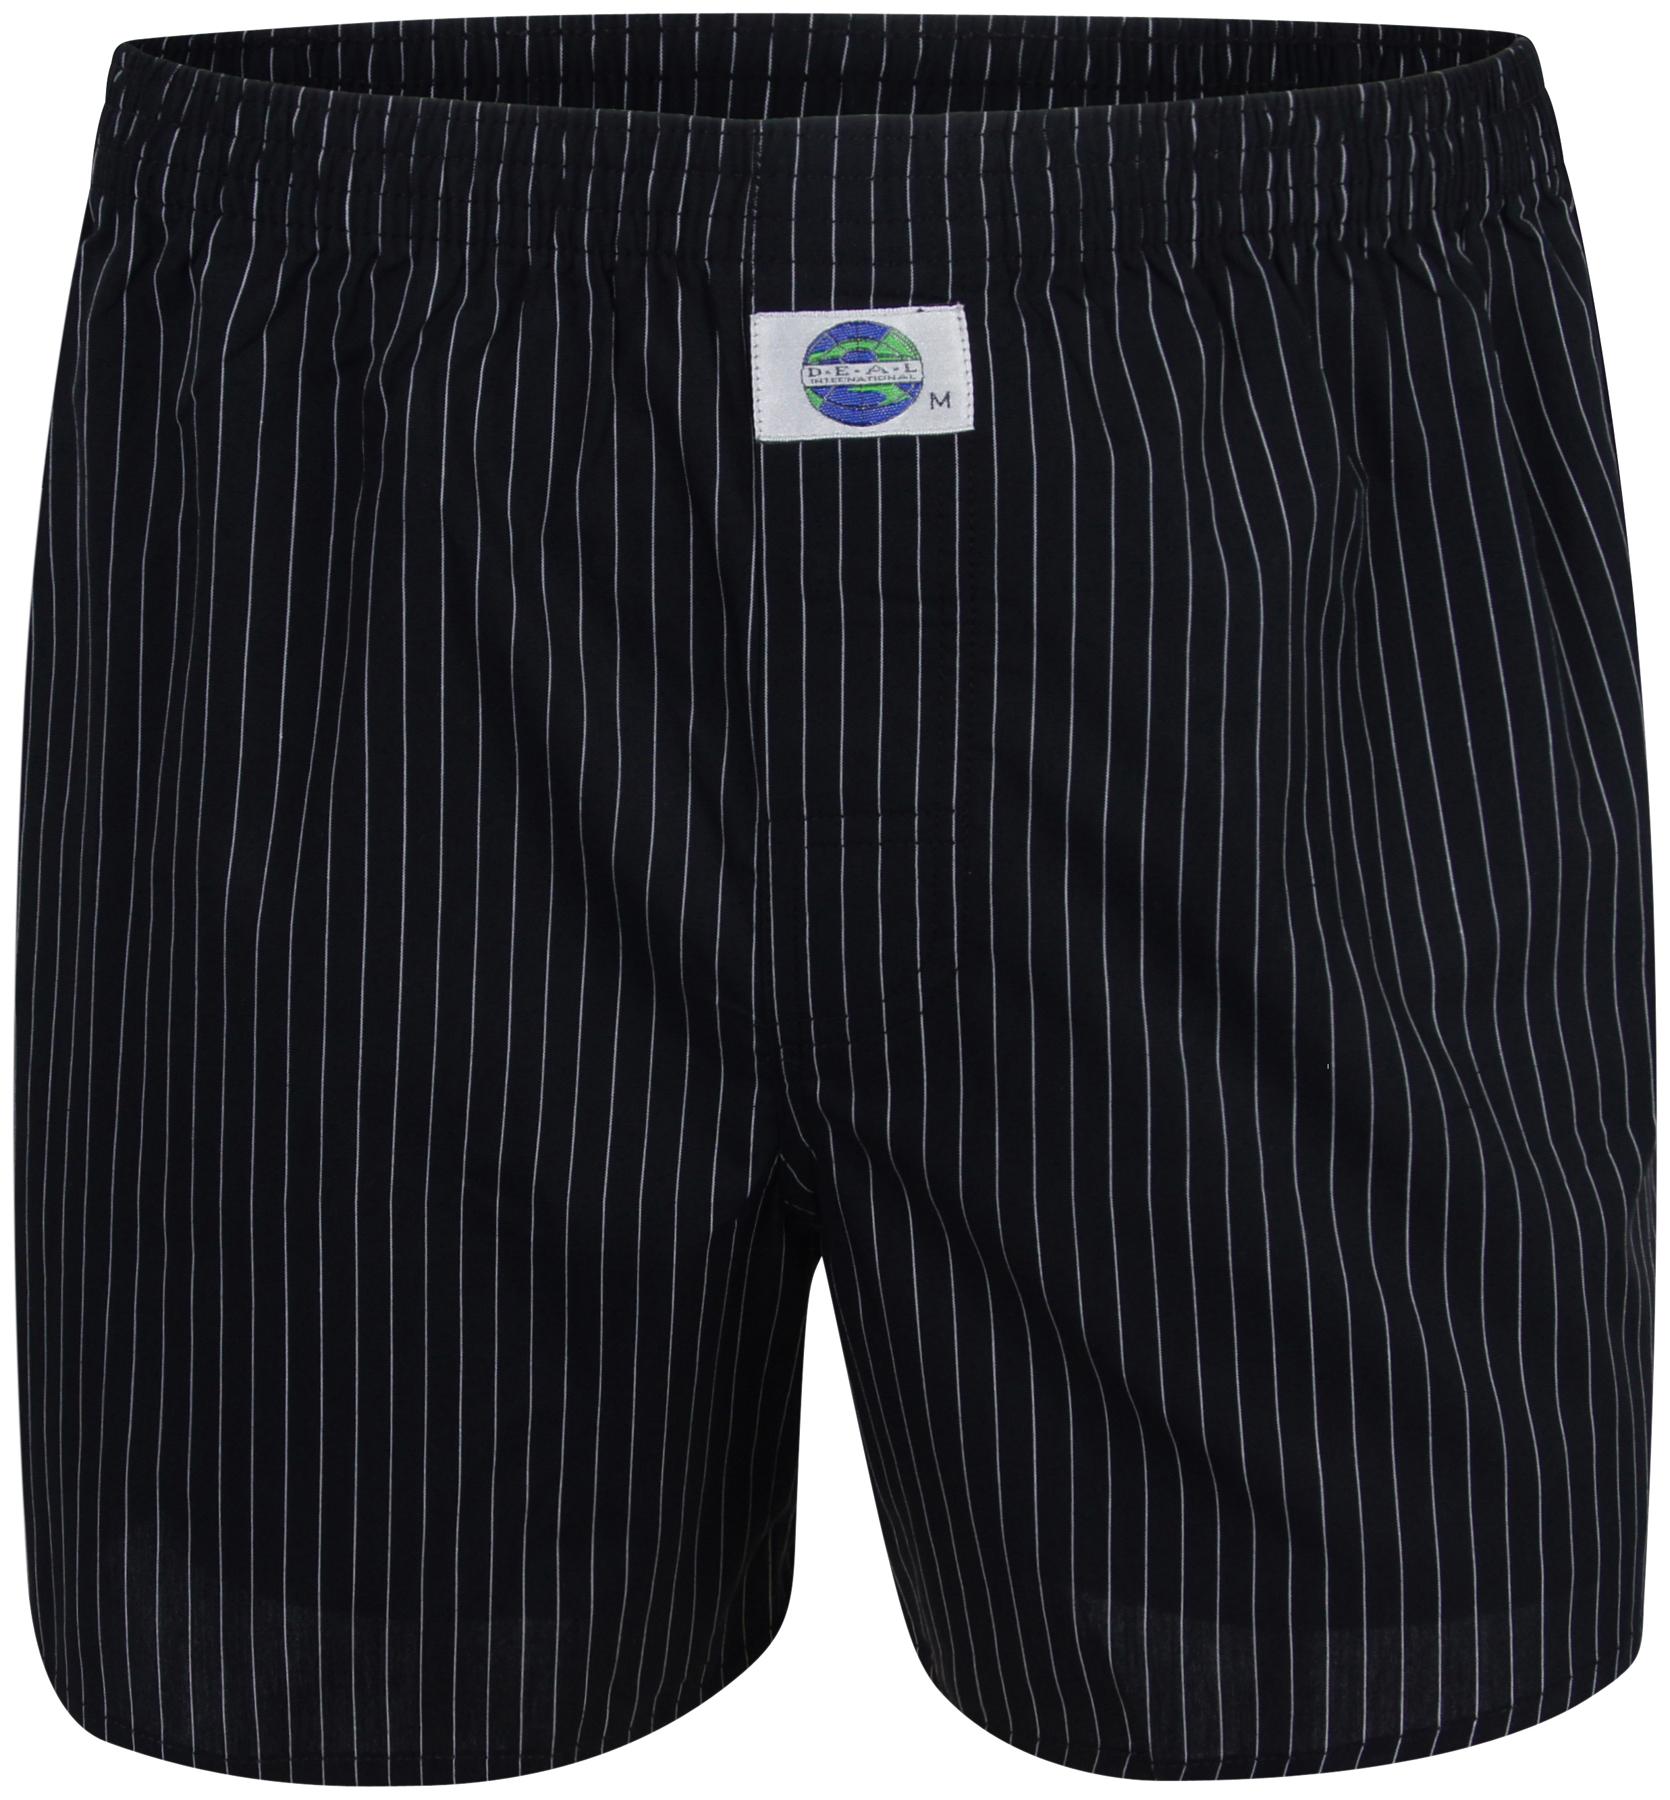 deal boxer shorts pinstripe black white 100 cotton s m l. Black Bedroom Furniture Sets. Home Design Ideas